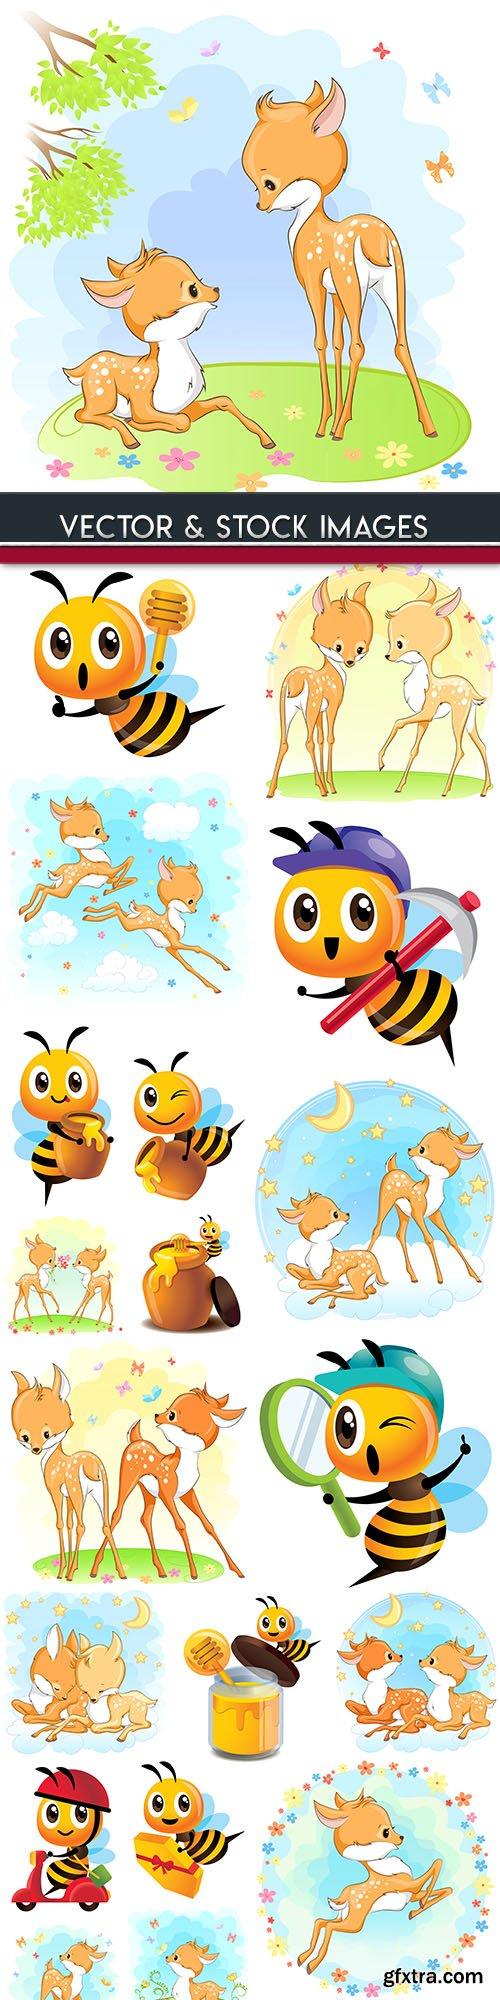 Amusing deer and bee cartoon illustration design